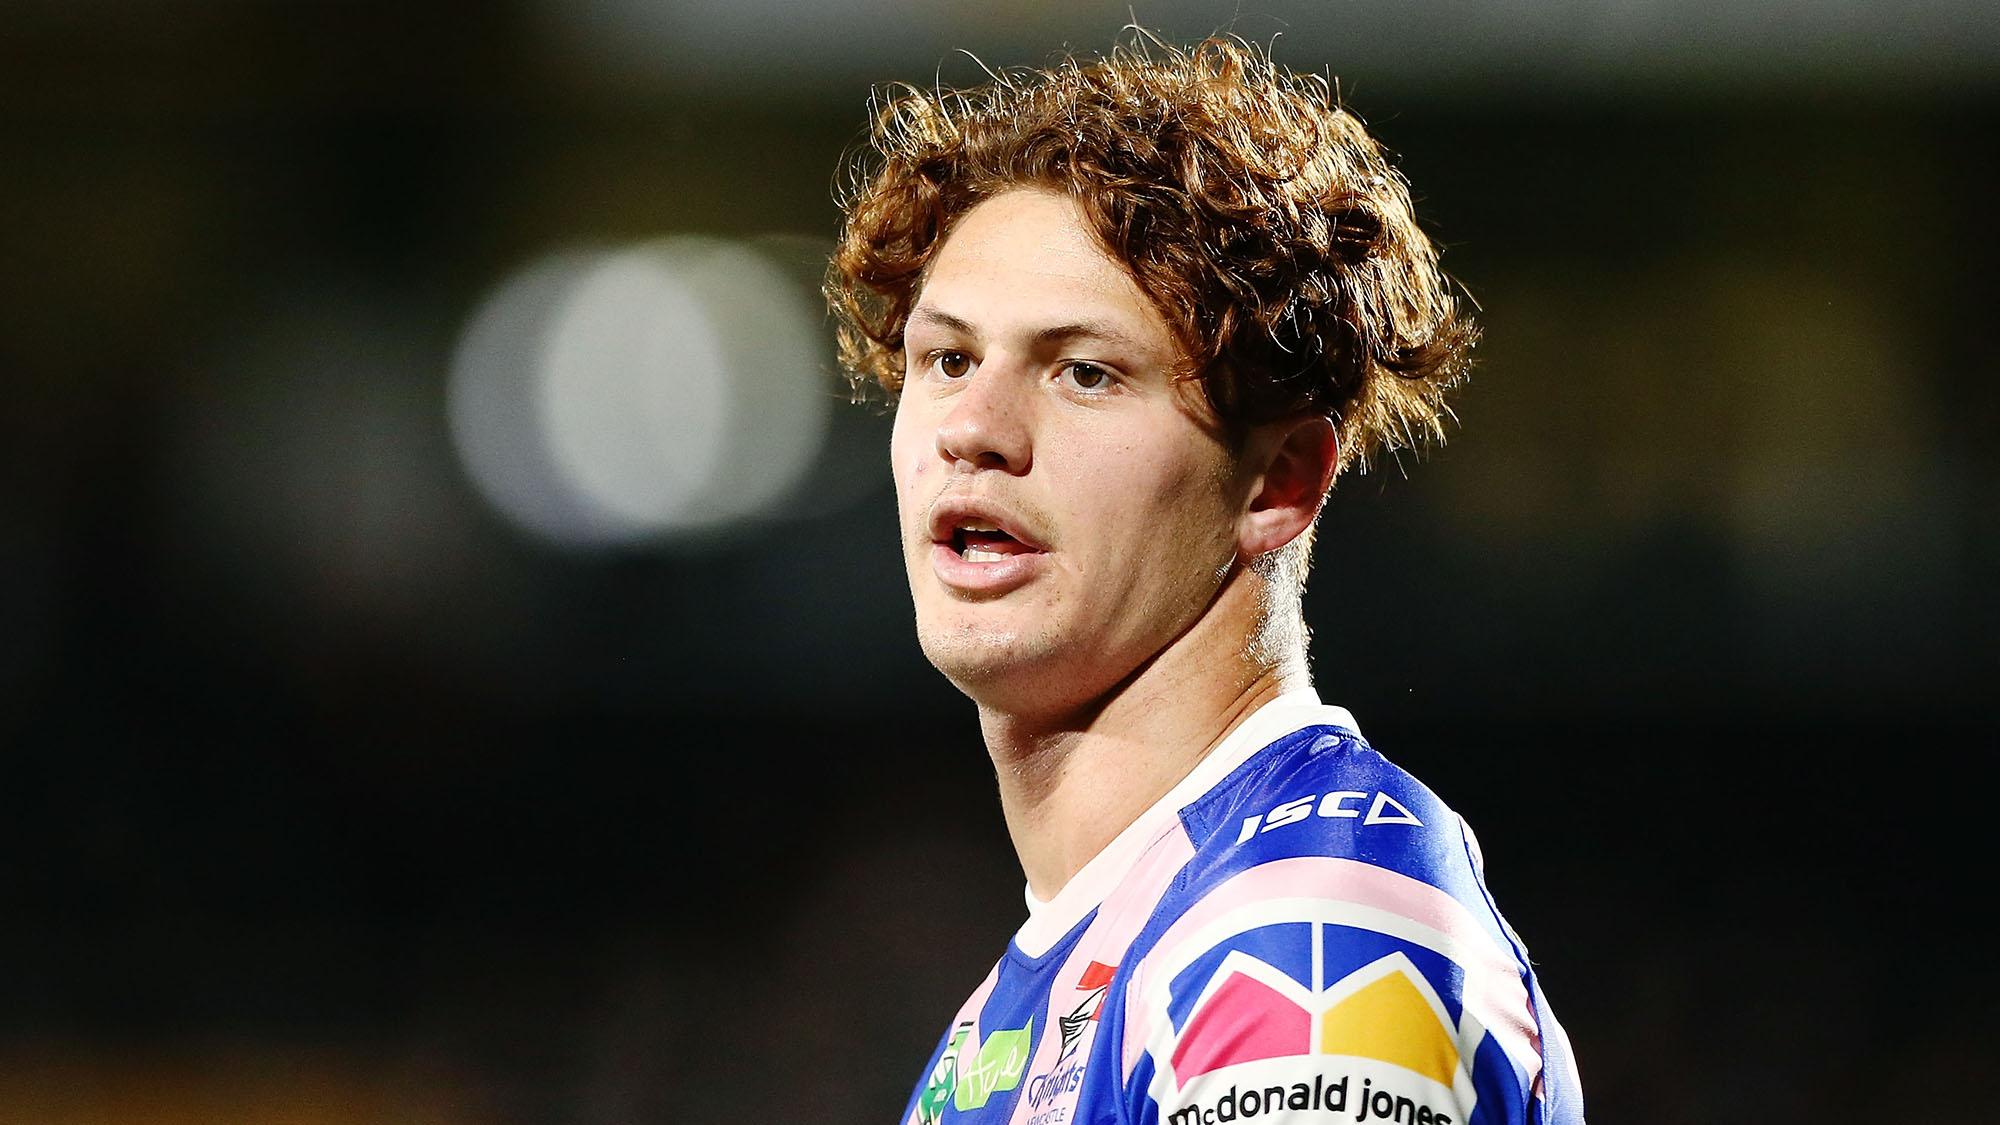 Kalyn Ponga capable of wearing No.6 Queensland jumper, says Darren Lockyer